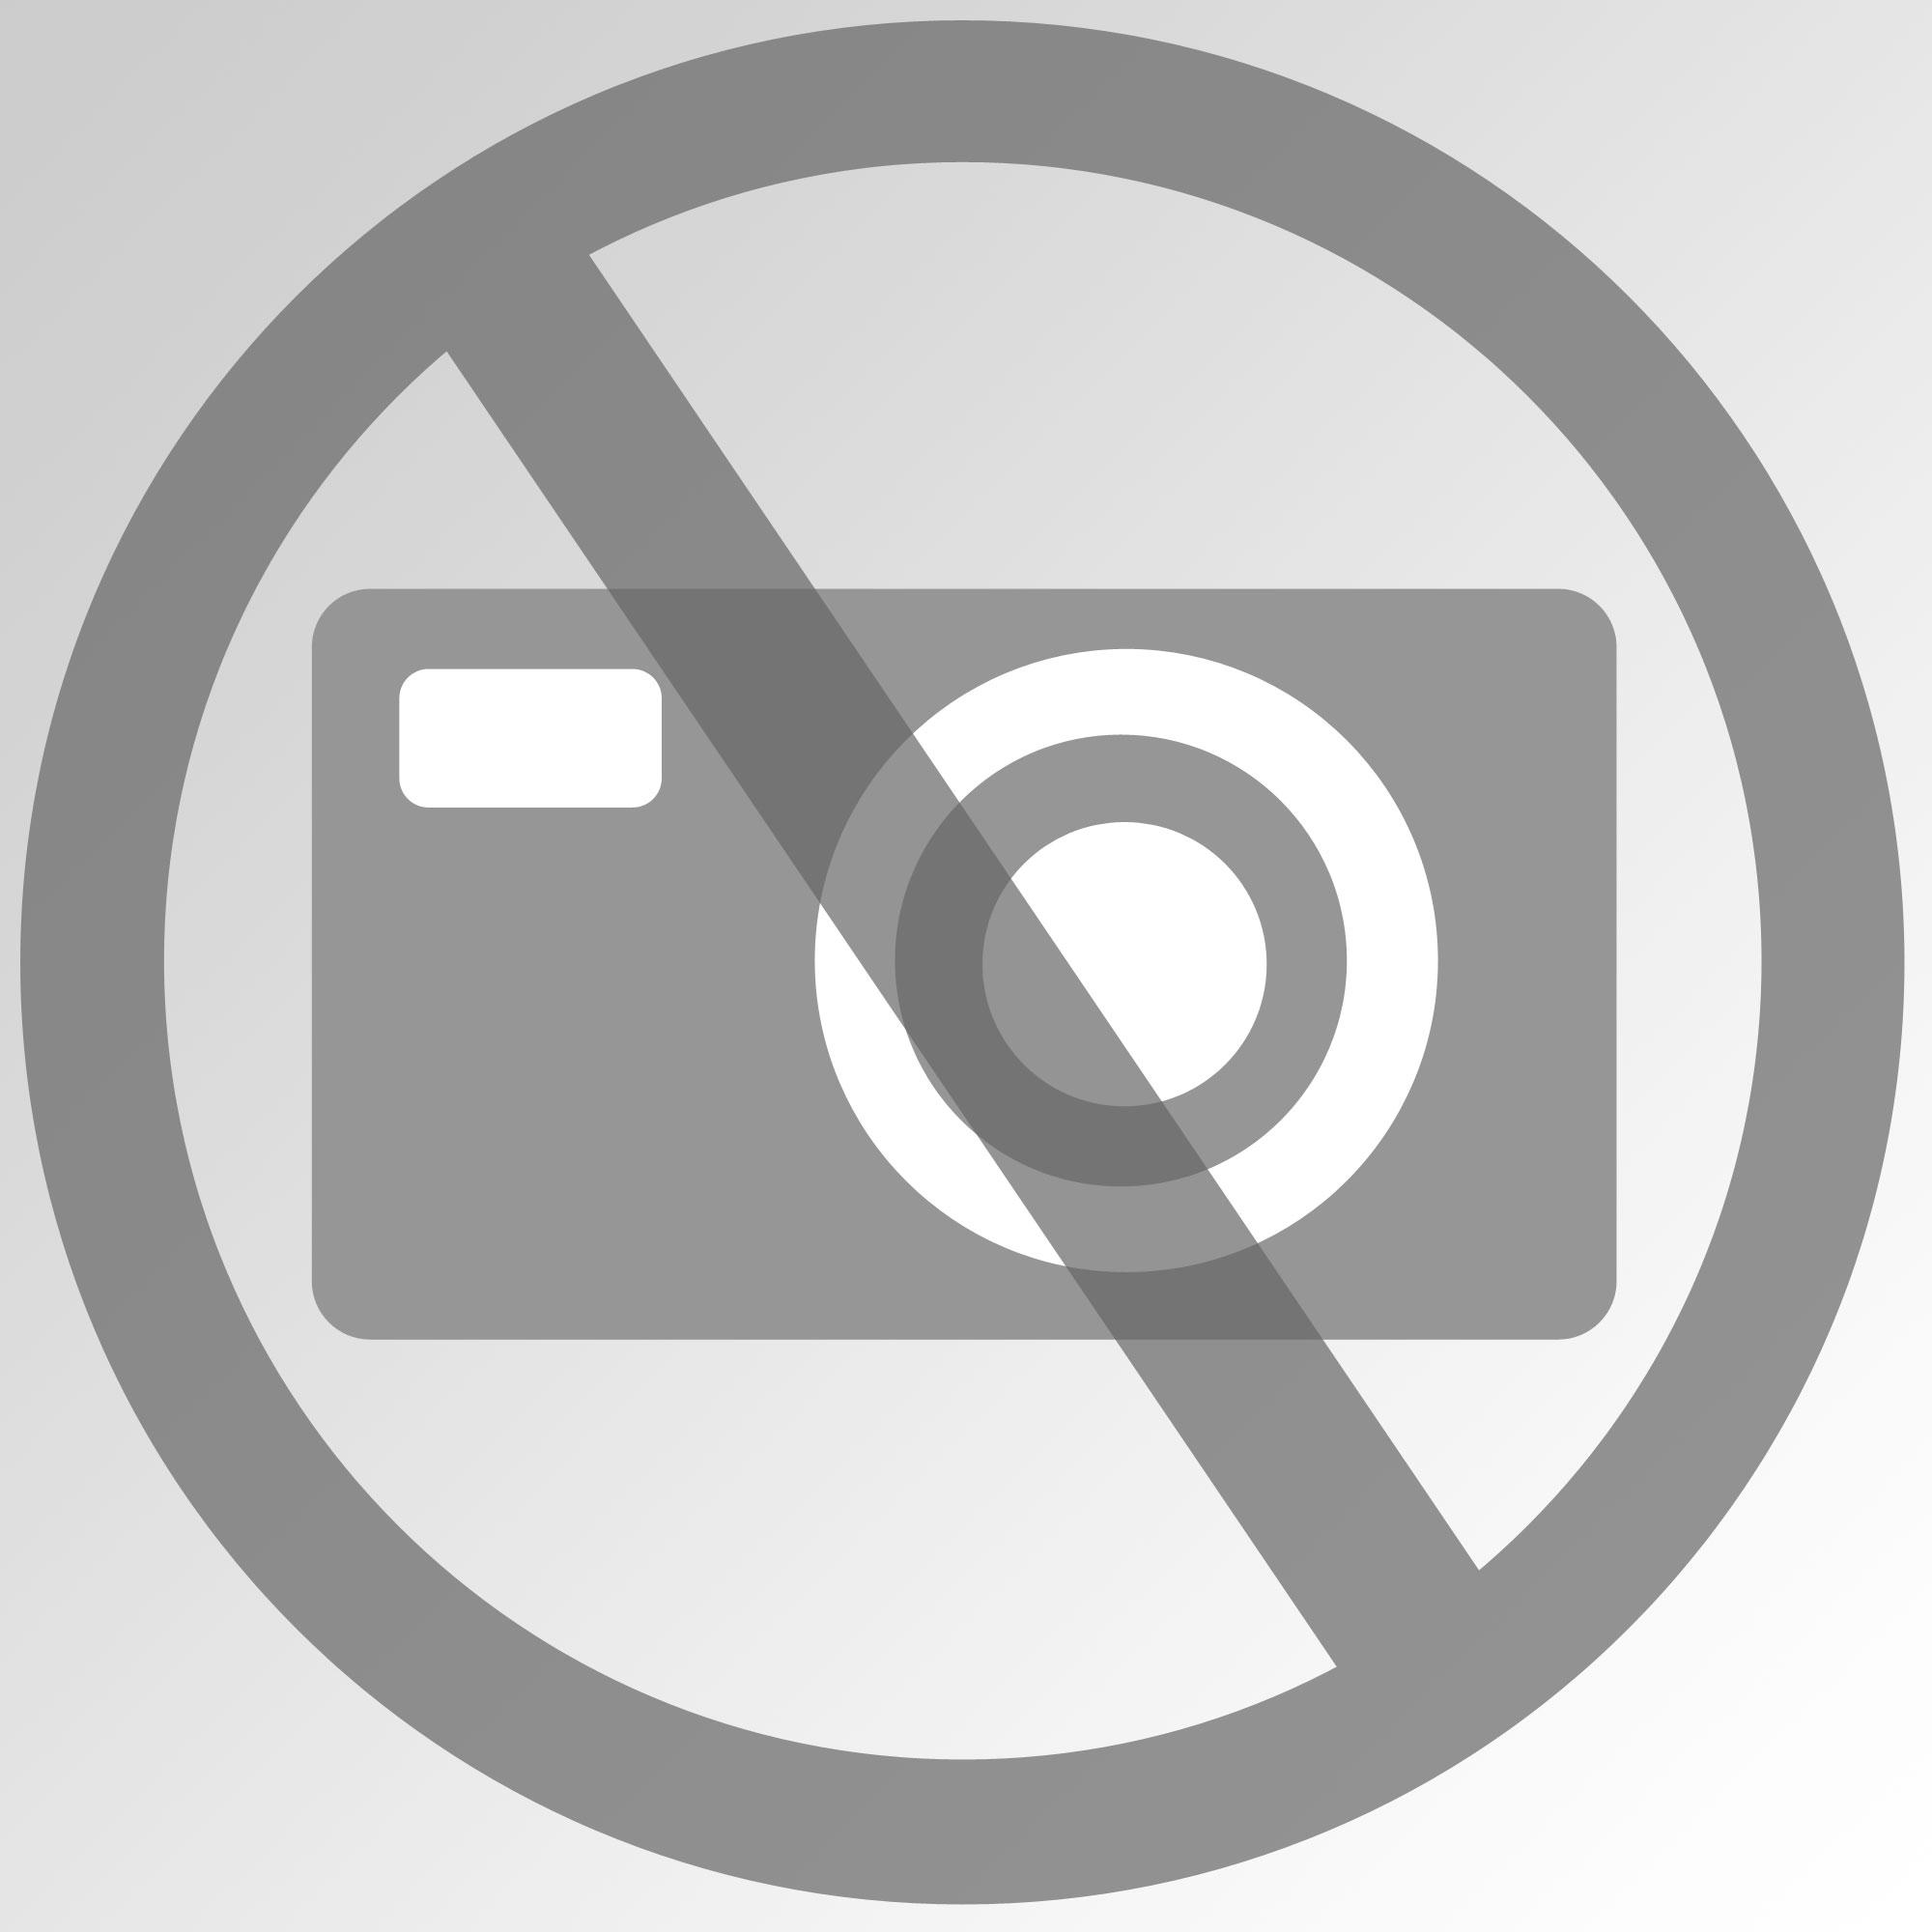 Kiehl Dopomat-brillant 10 l Automatenreiniger mit Glanzpflege